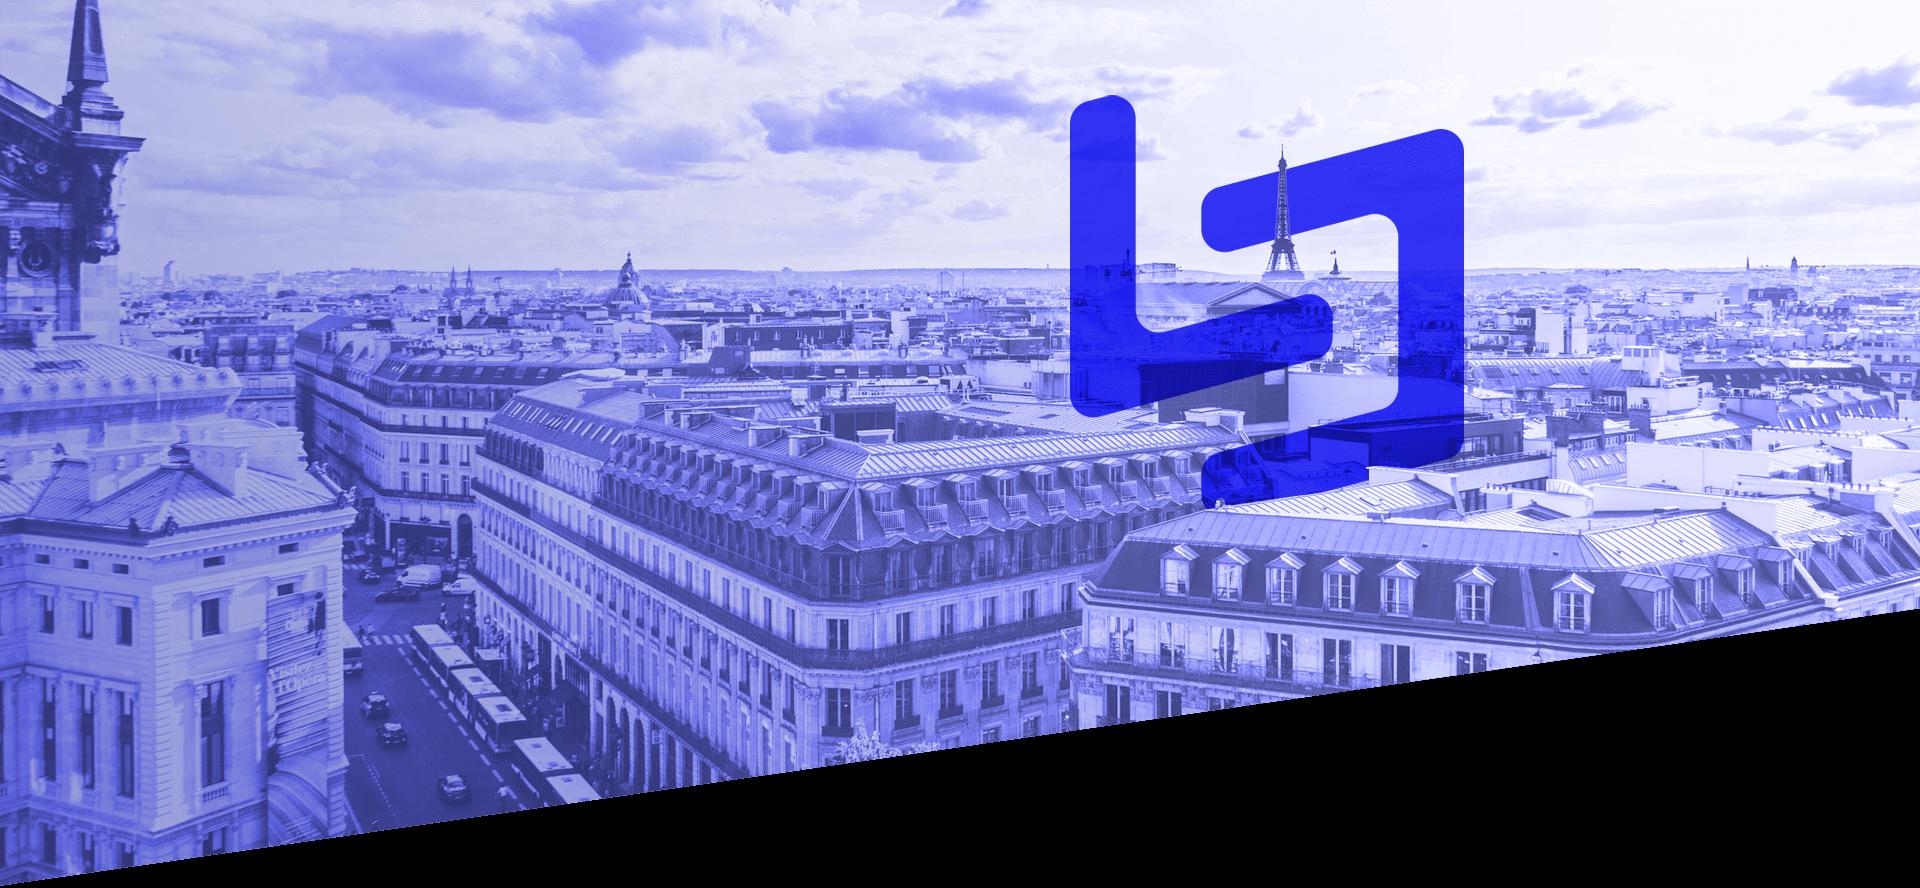 Paris Finance translation